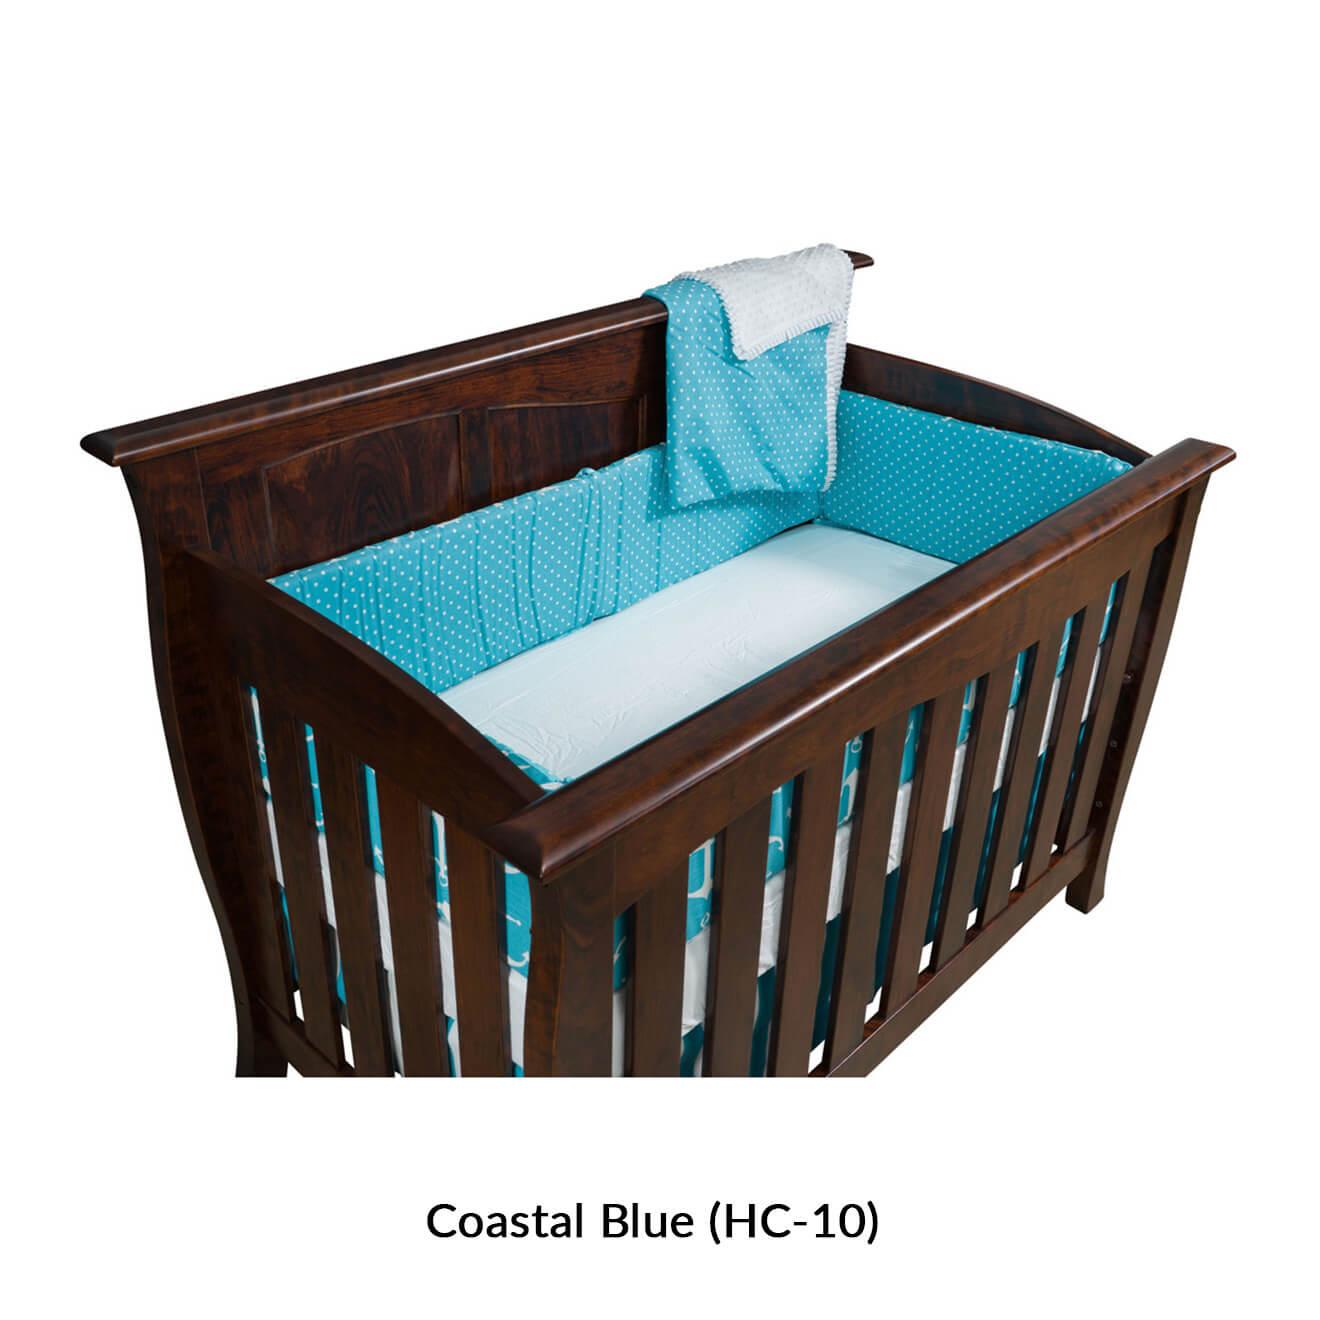 12.-coastal-blue-hc-10-.jpg